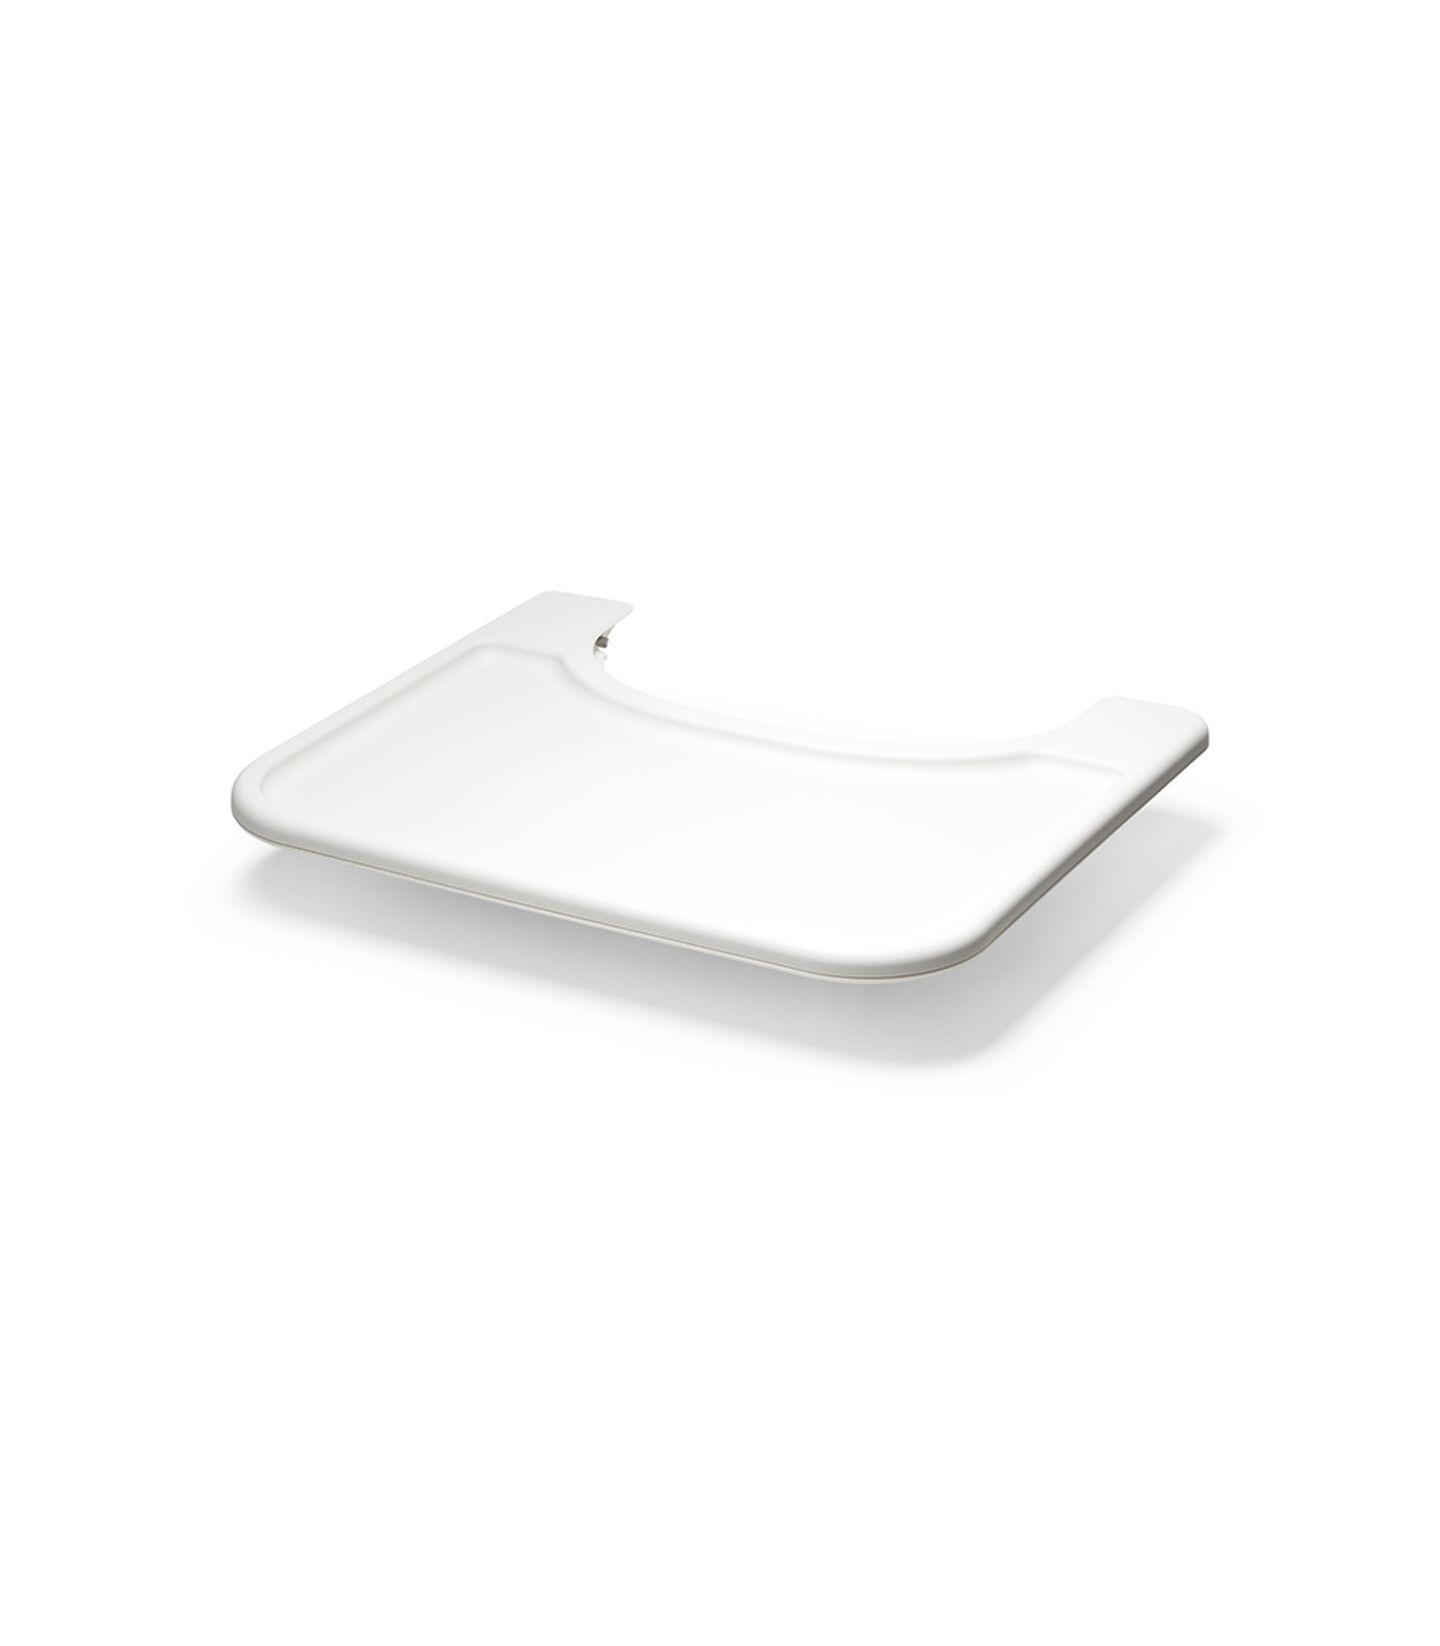 Stokke® Steps™ Baby Set Tray Blanco, Blanco, mainview view 2